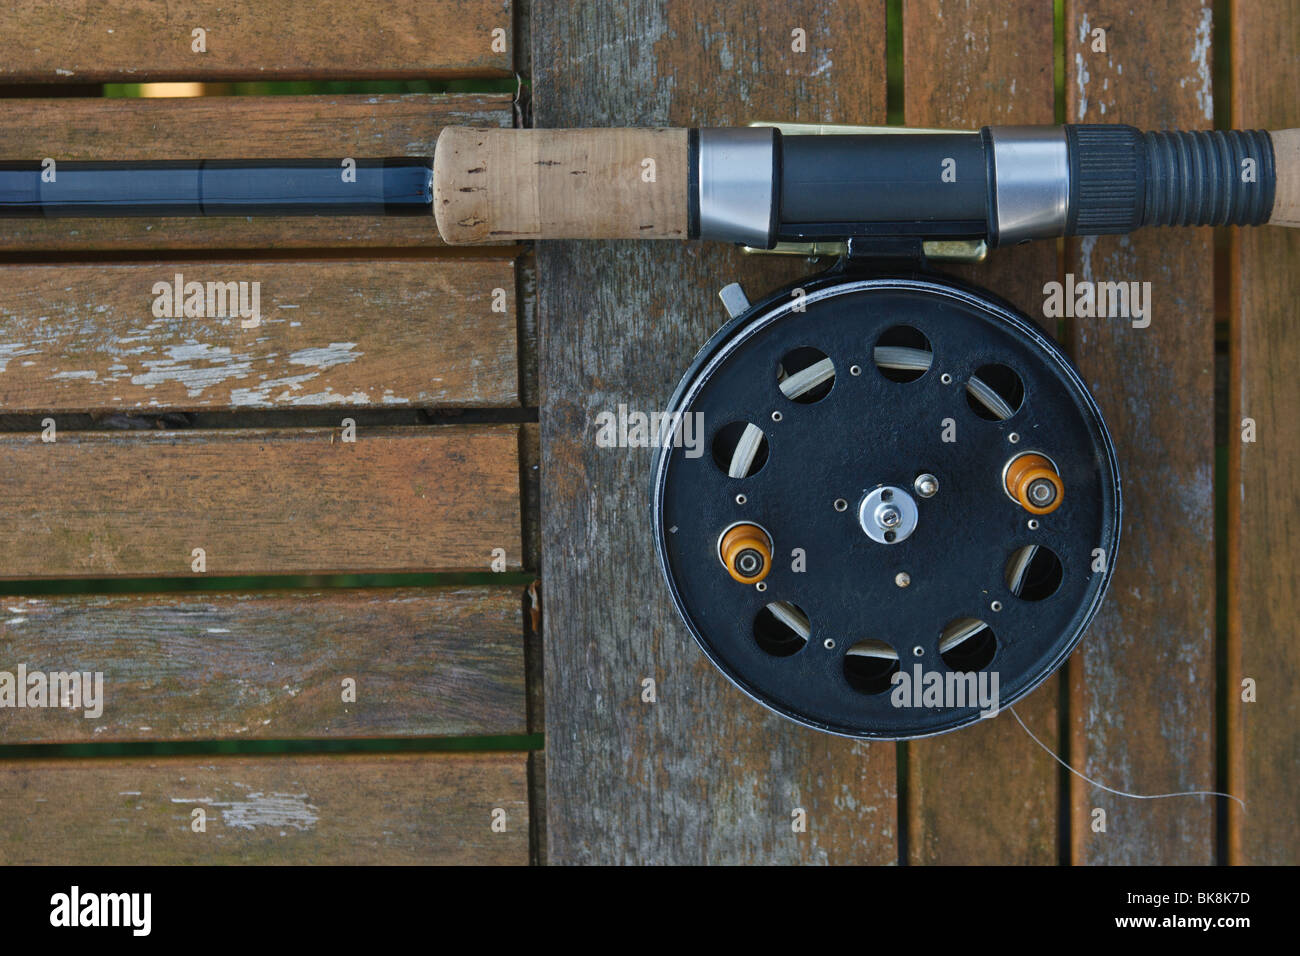 Speedia centre pin fishing reel vintage fishing tackle for Center pin fishing